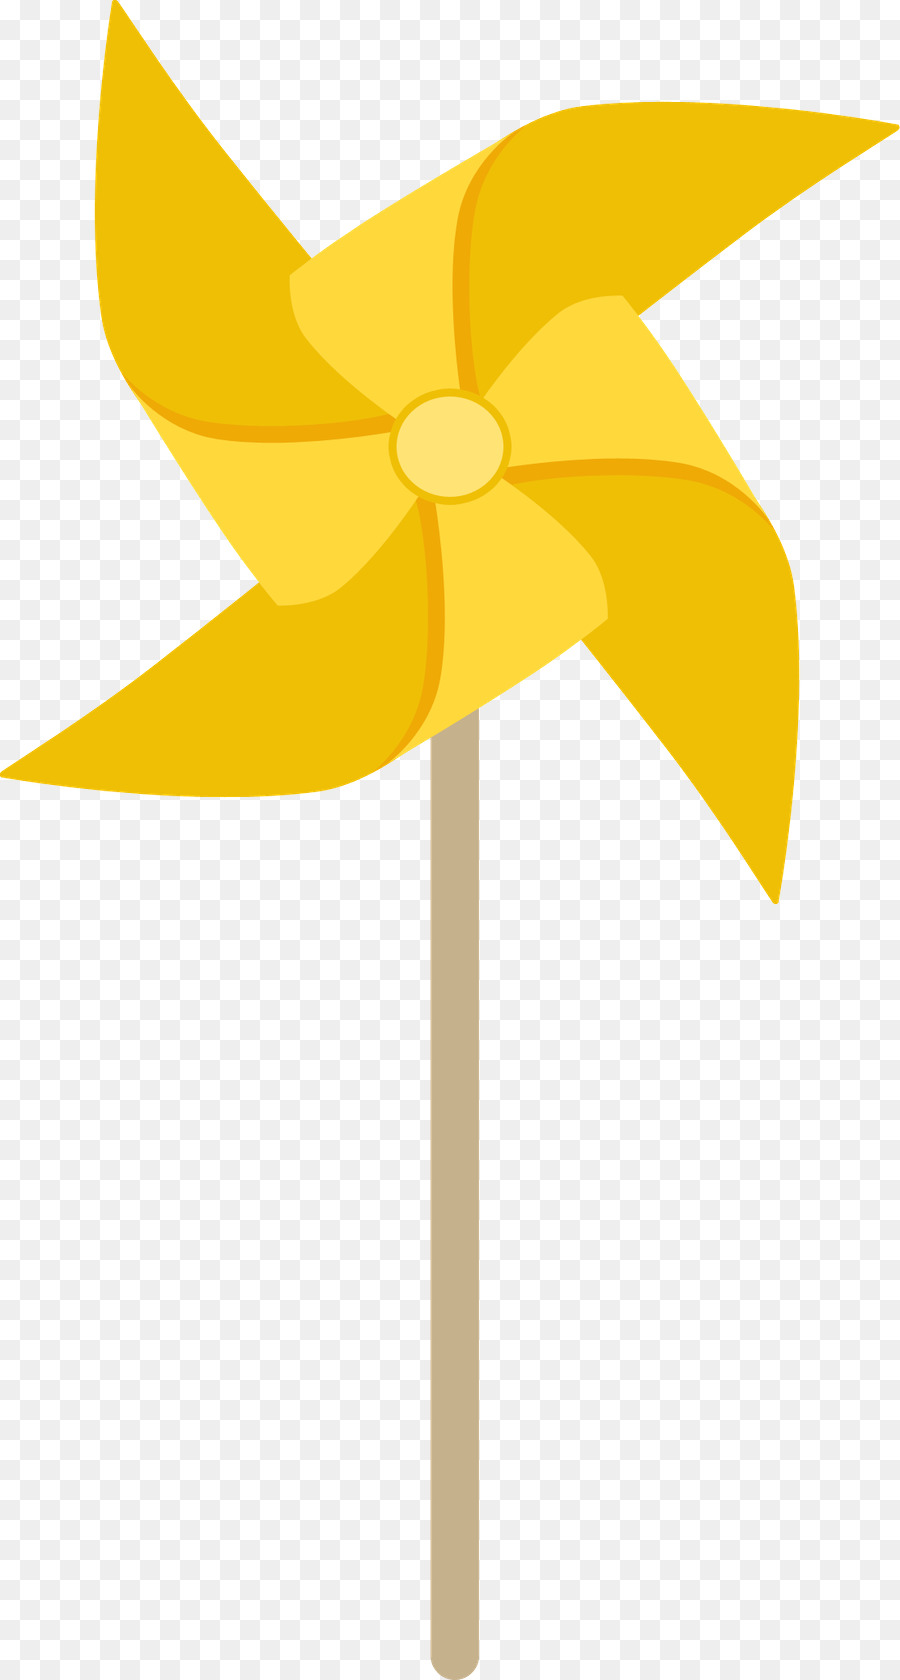 Pinwheel Windmill Clip art.